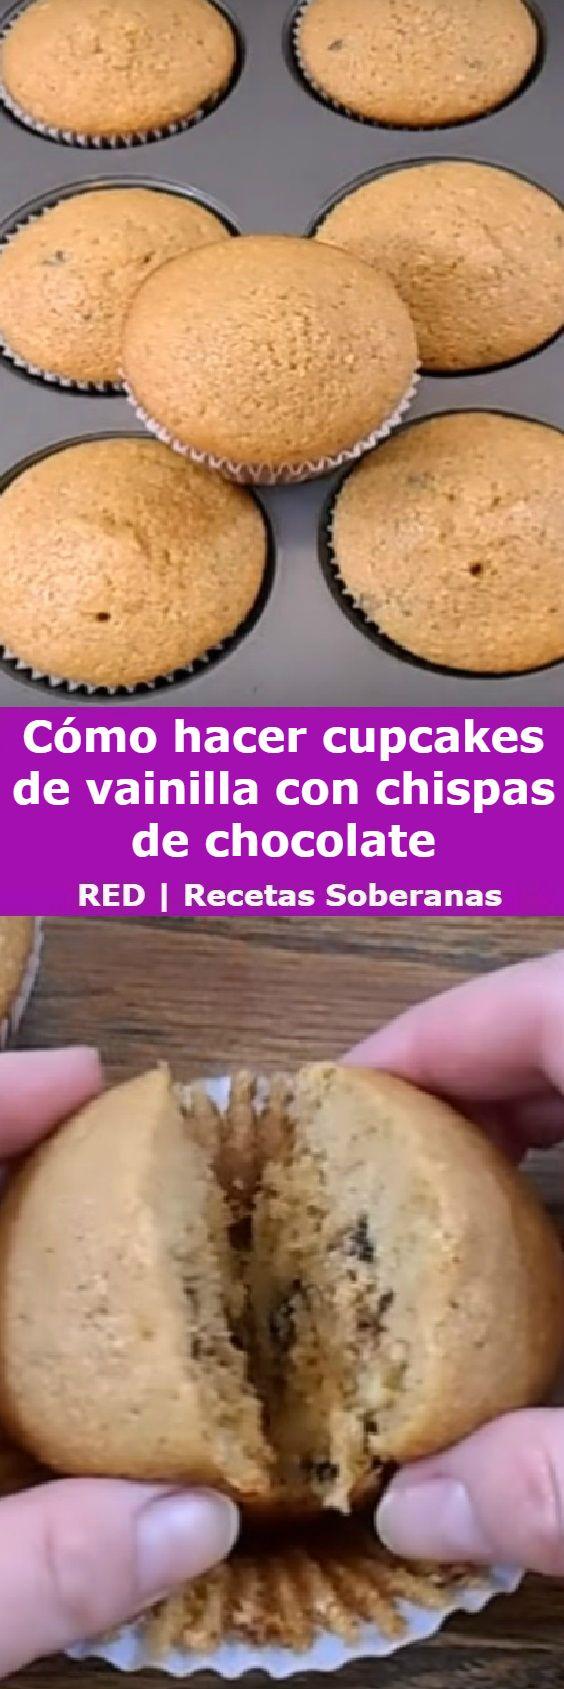 Cómo hacer cupcakes de vainilla con chispas de chocolate, receta básica.  #chispas #cakes #cupcakes #vainilla #comohacer #perfect #postres #receta #recipe #casero #torta #tartas #pastel #nestlecocina #bizcocho #bizcochuelo #tasty #cocina #chocolate #pan #panes   Si te gusta dinos HOLA y dale a Me Gusta MIREN